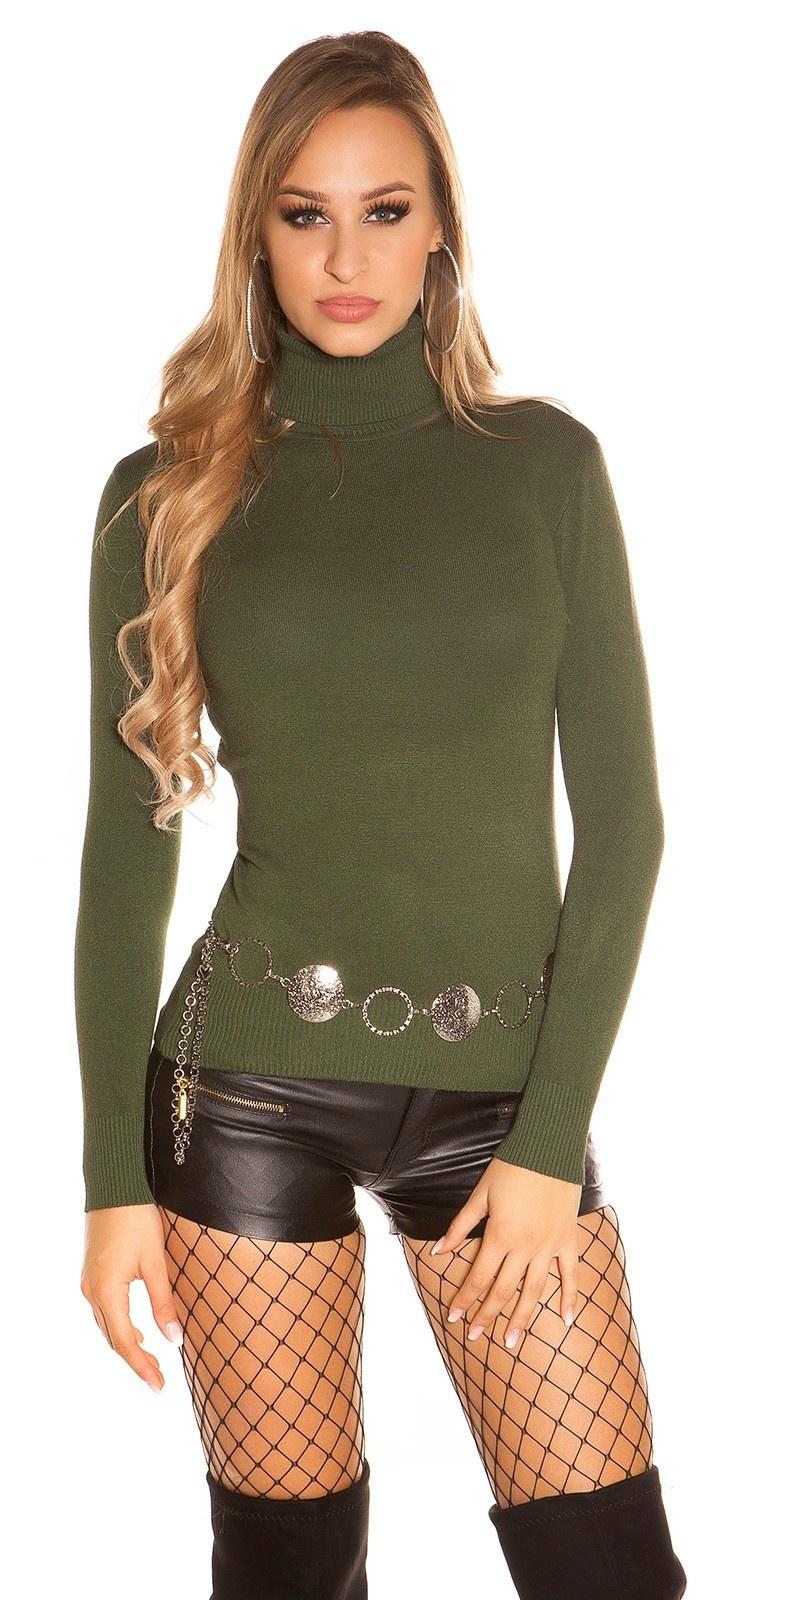 Trendy basic col pullover khaki